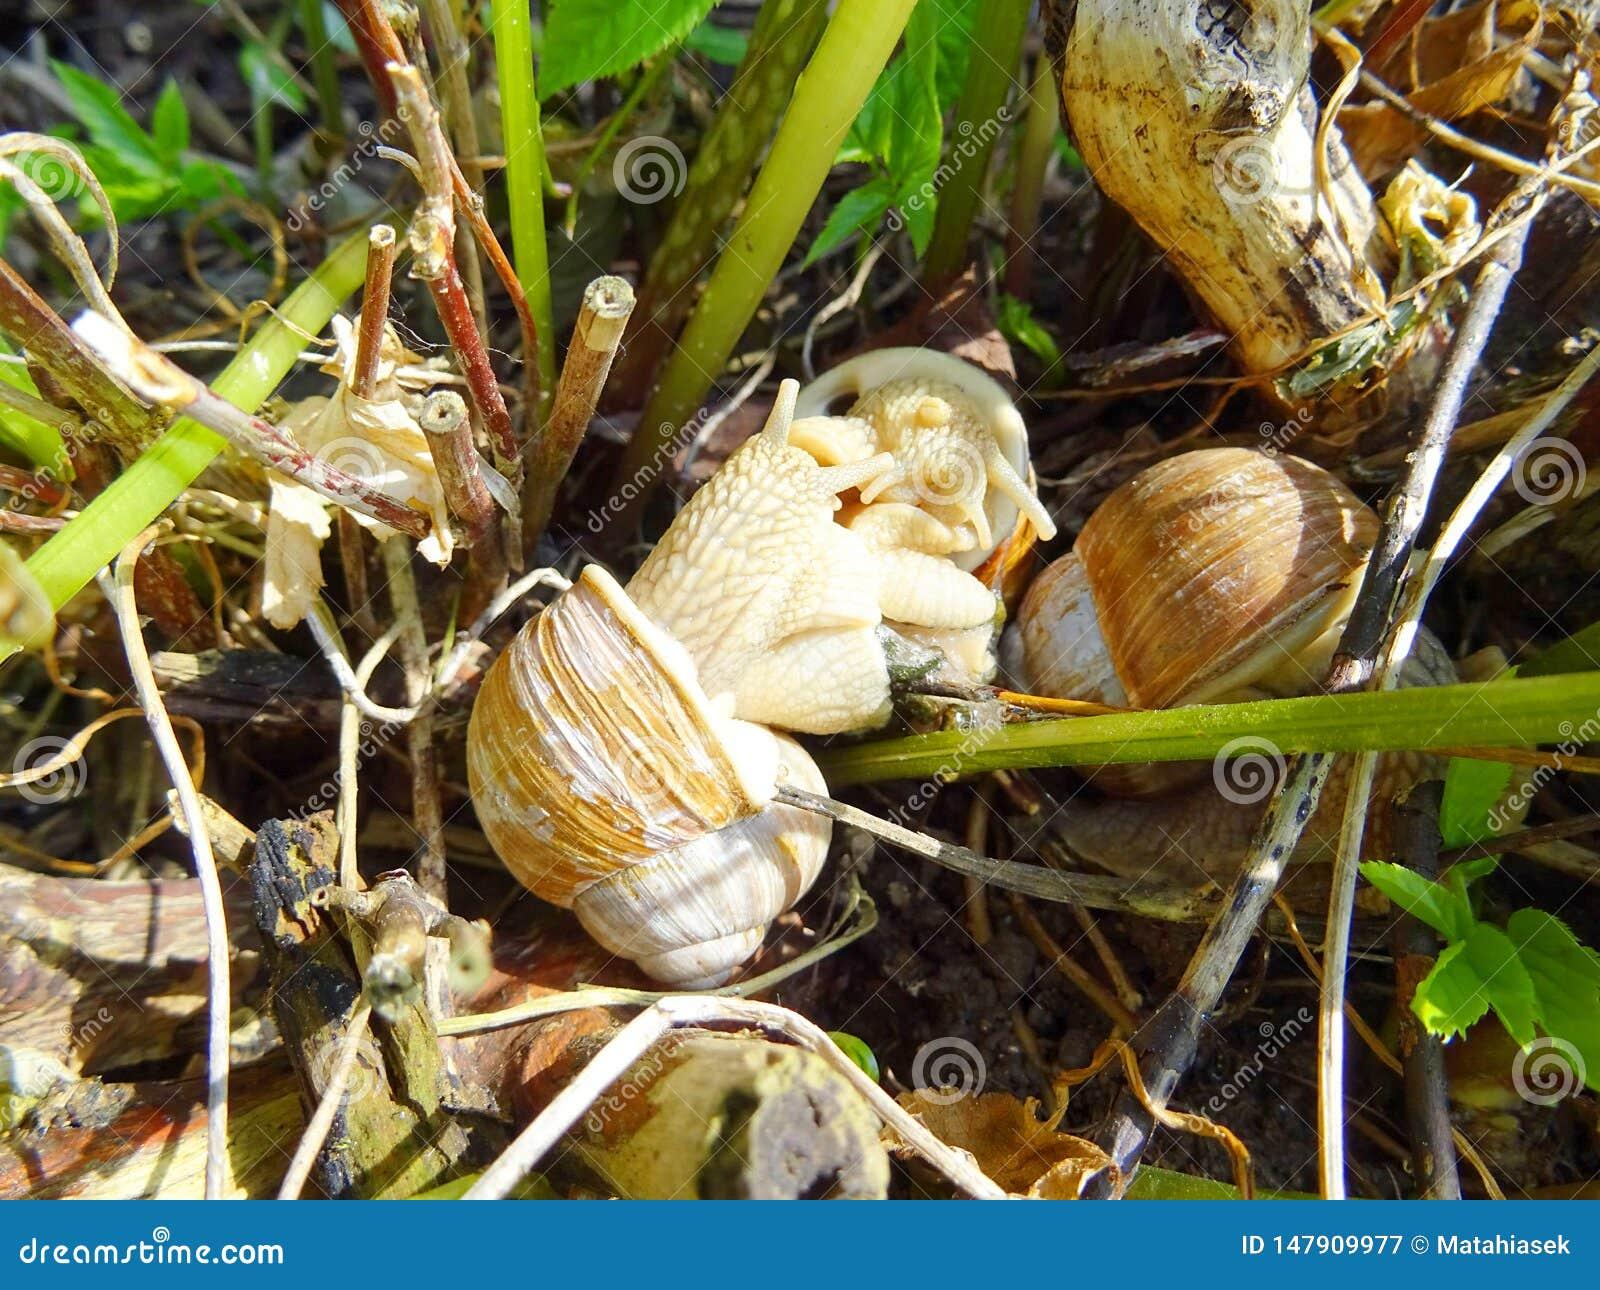 Pomatia adulto de la hélice de tres caracoles en el jardín